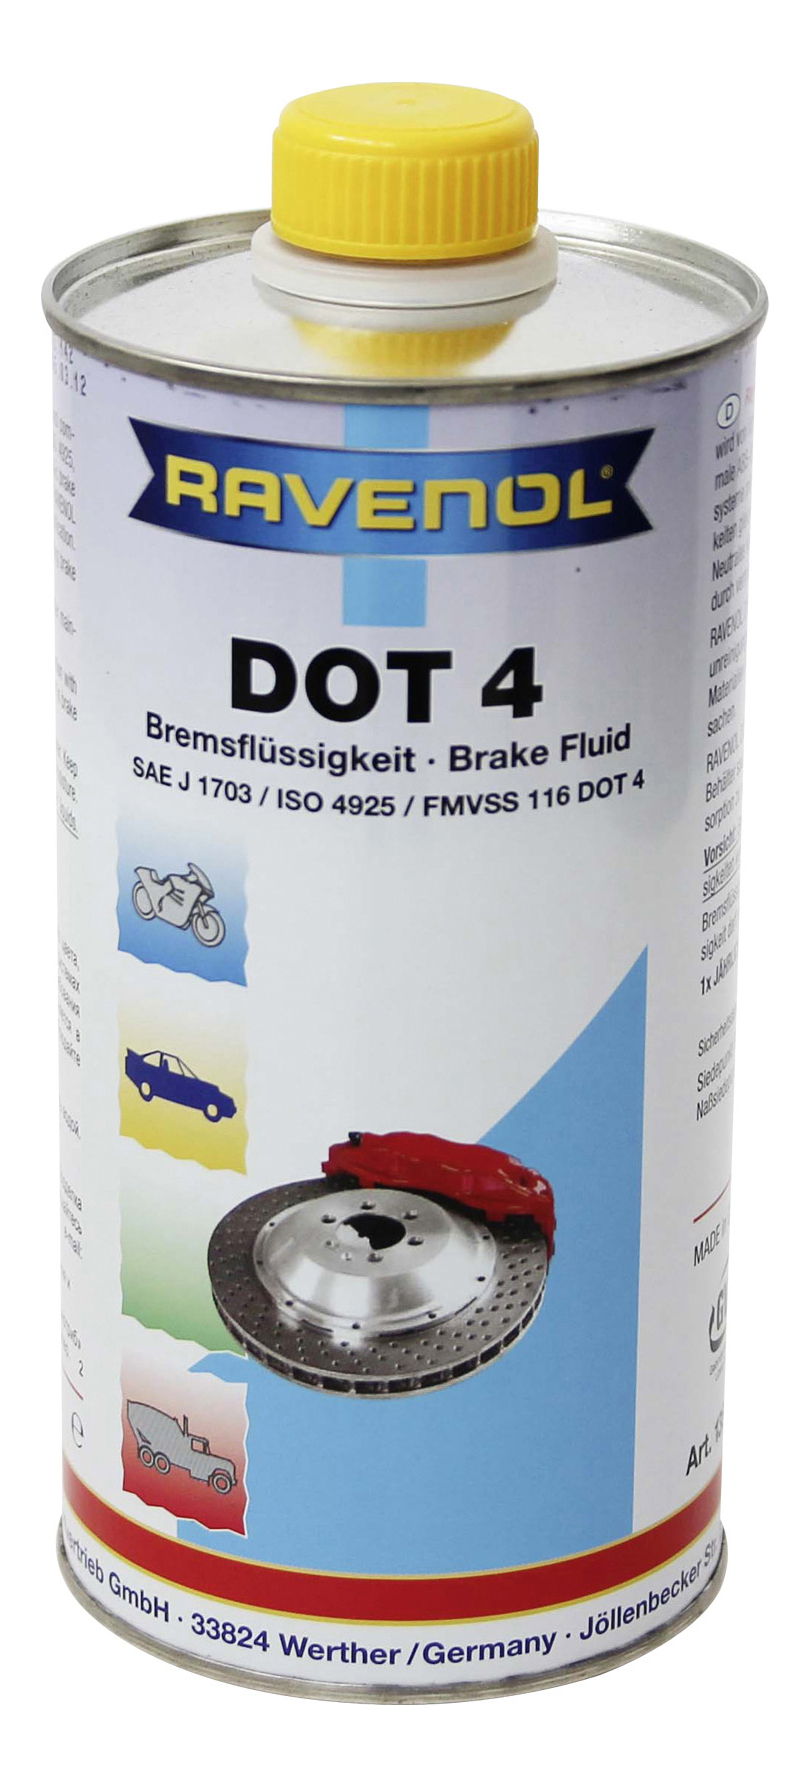 Тормозная жидкость RAVENOL DOT 4 1л 1350601-001-01-000 фото